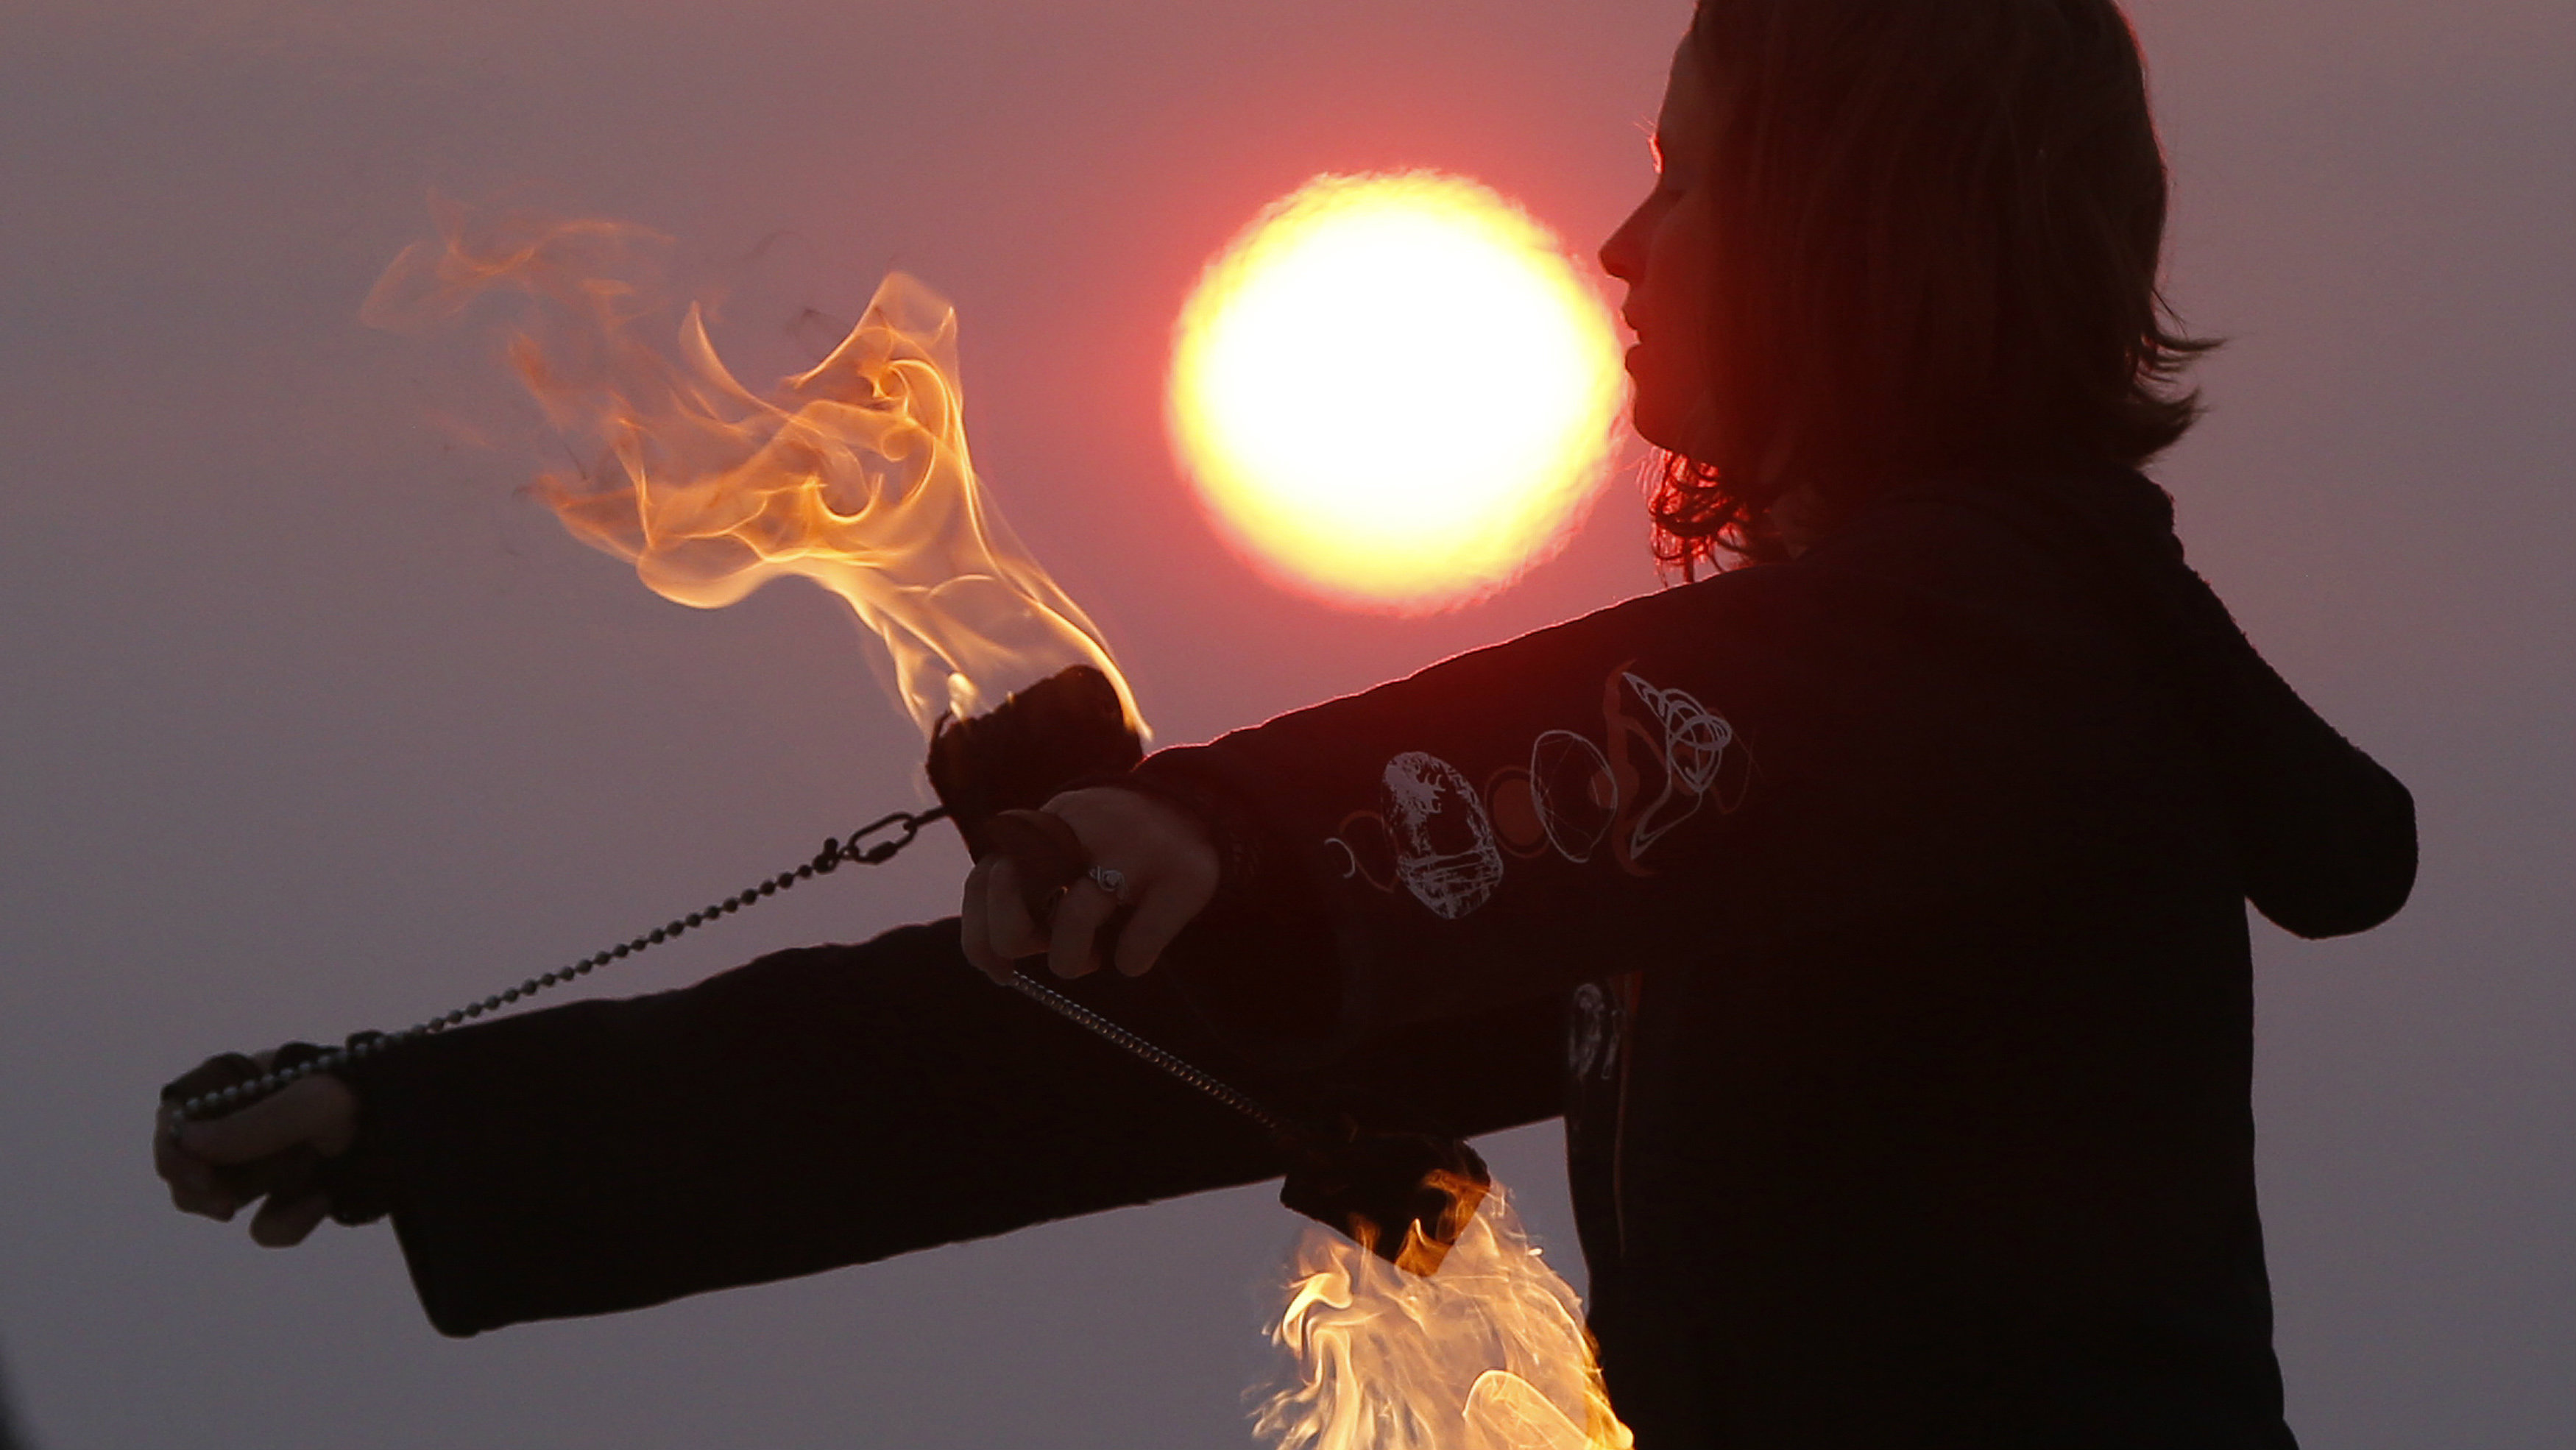 Fire thrower at Burning Man